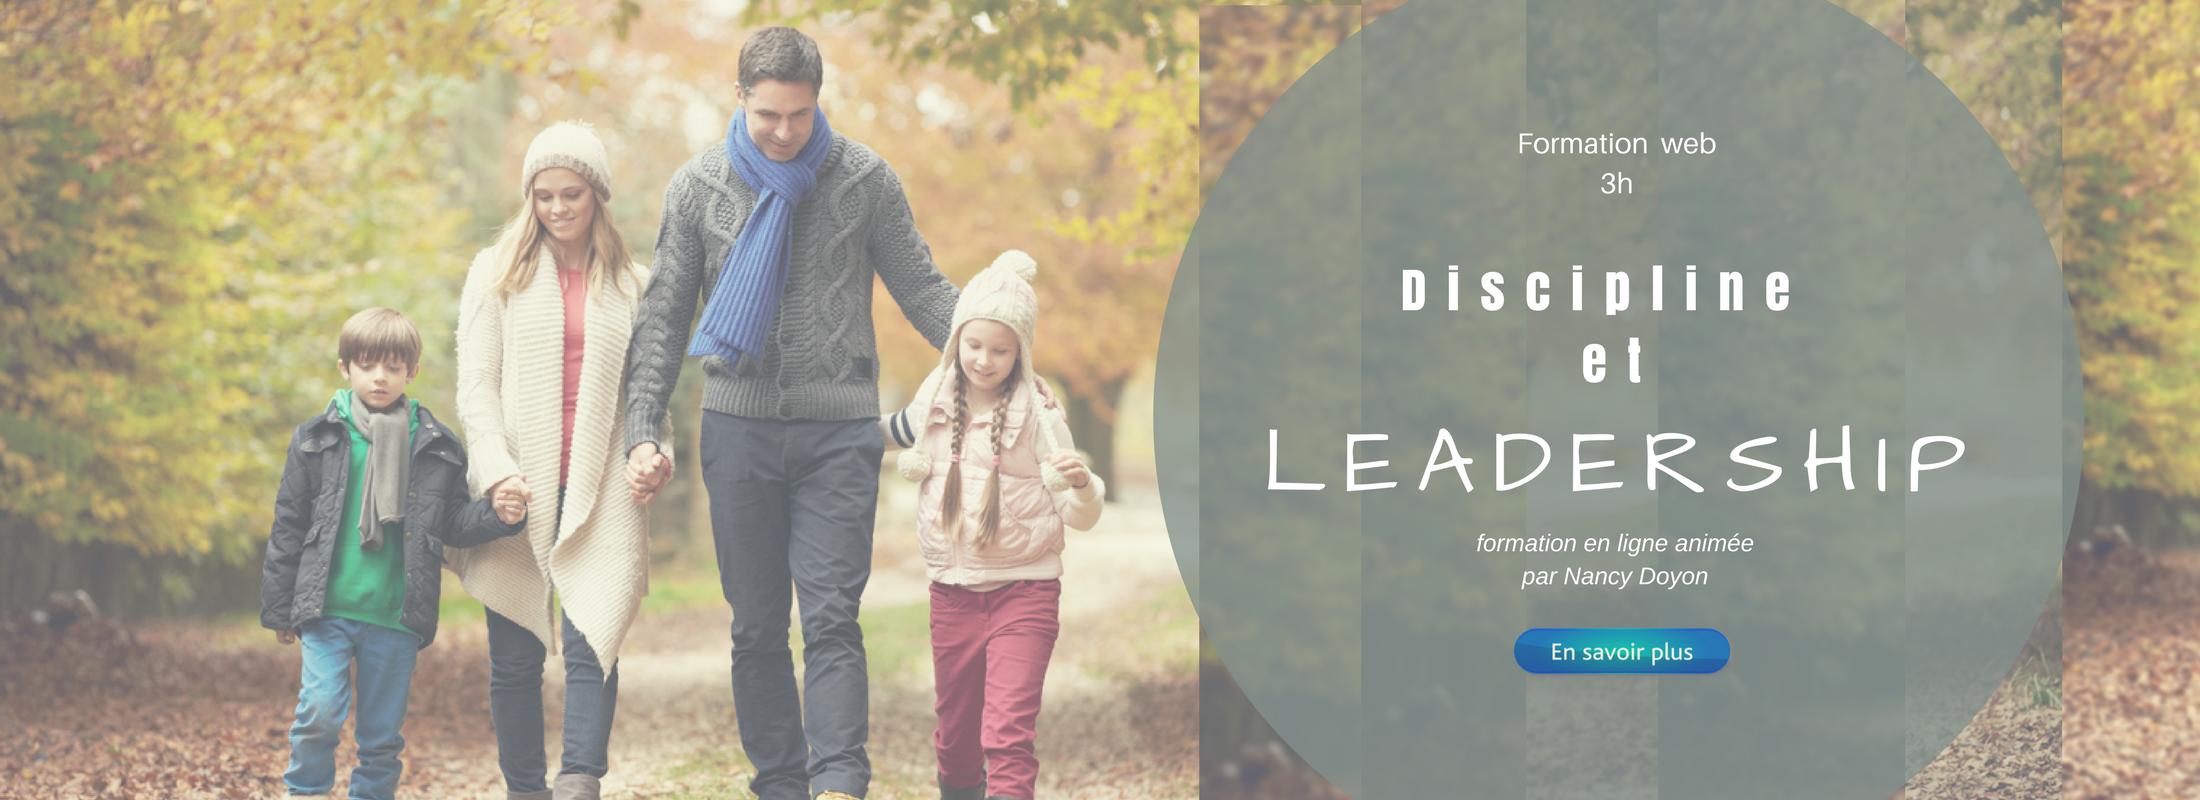 Discipline et leadership